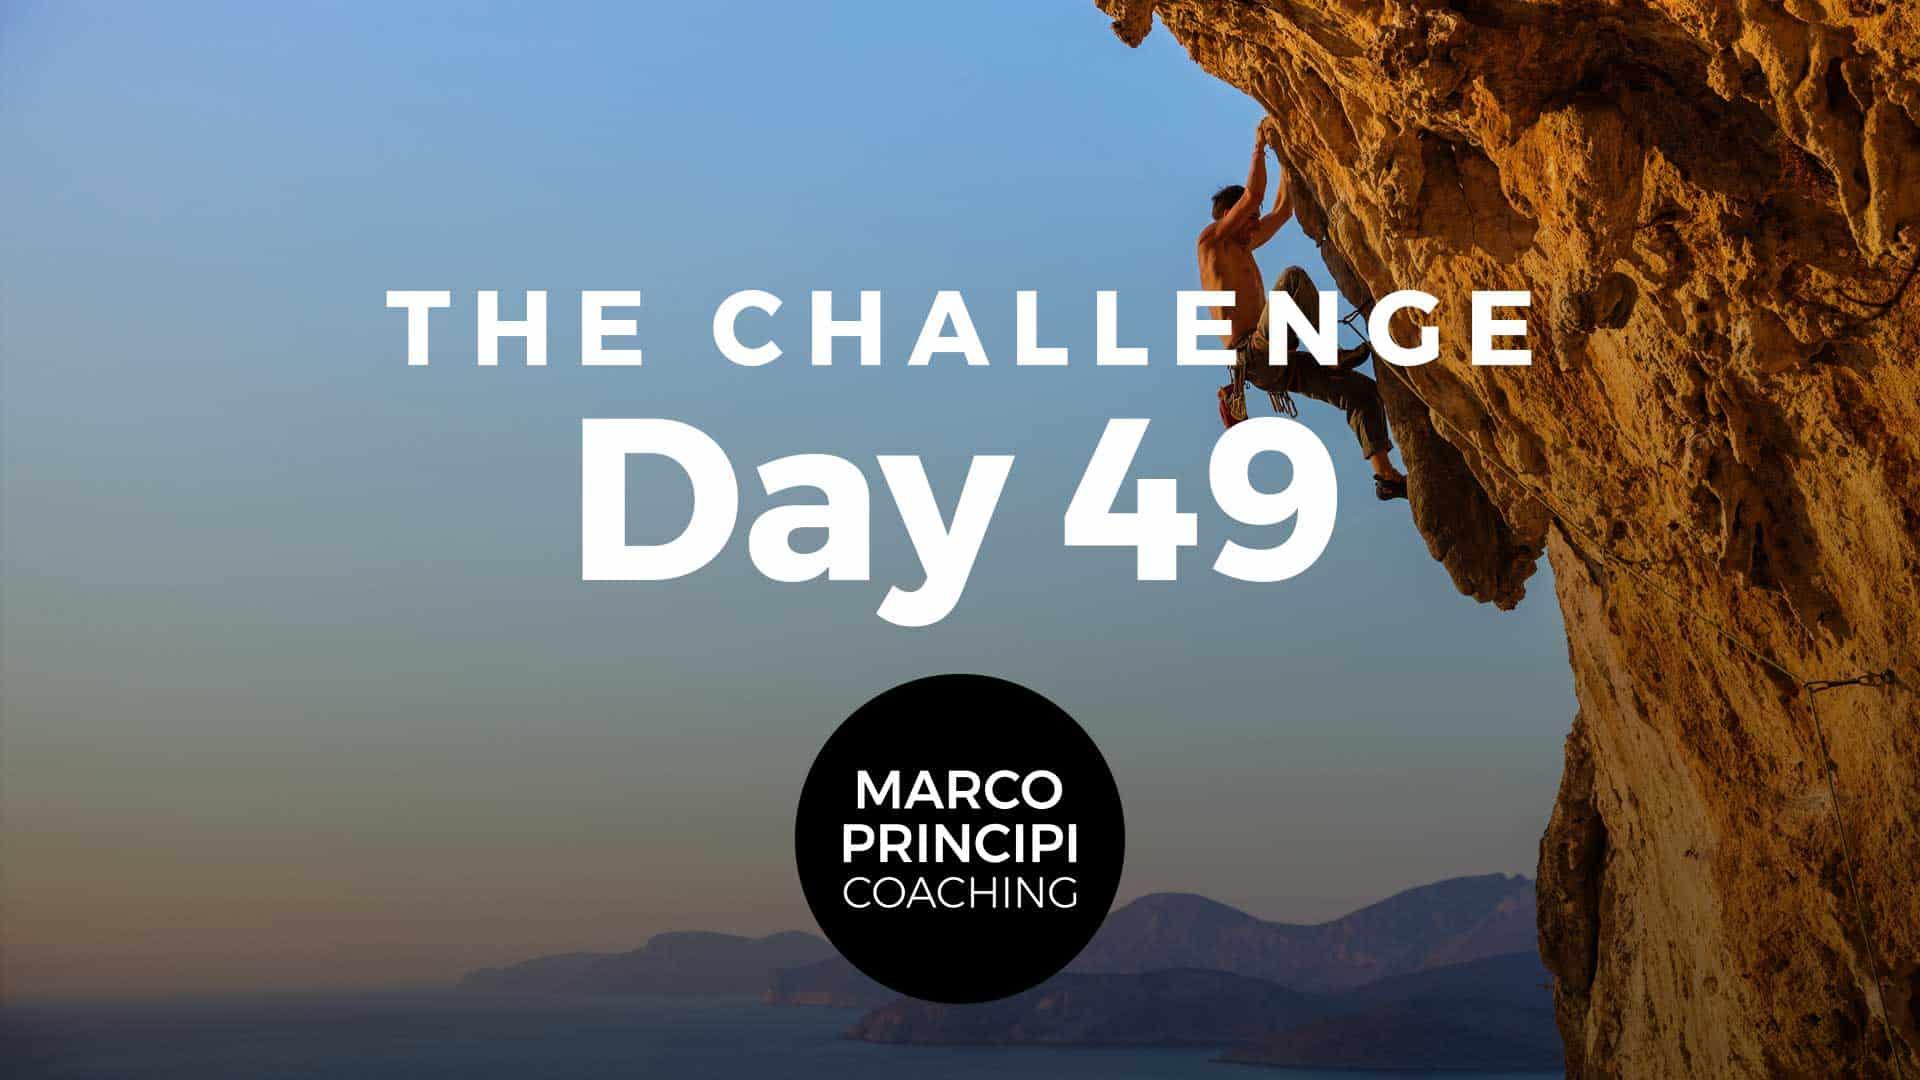 Marco Principi The Challenge Day 49